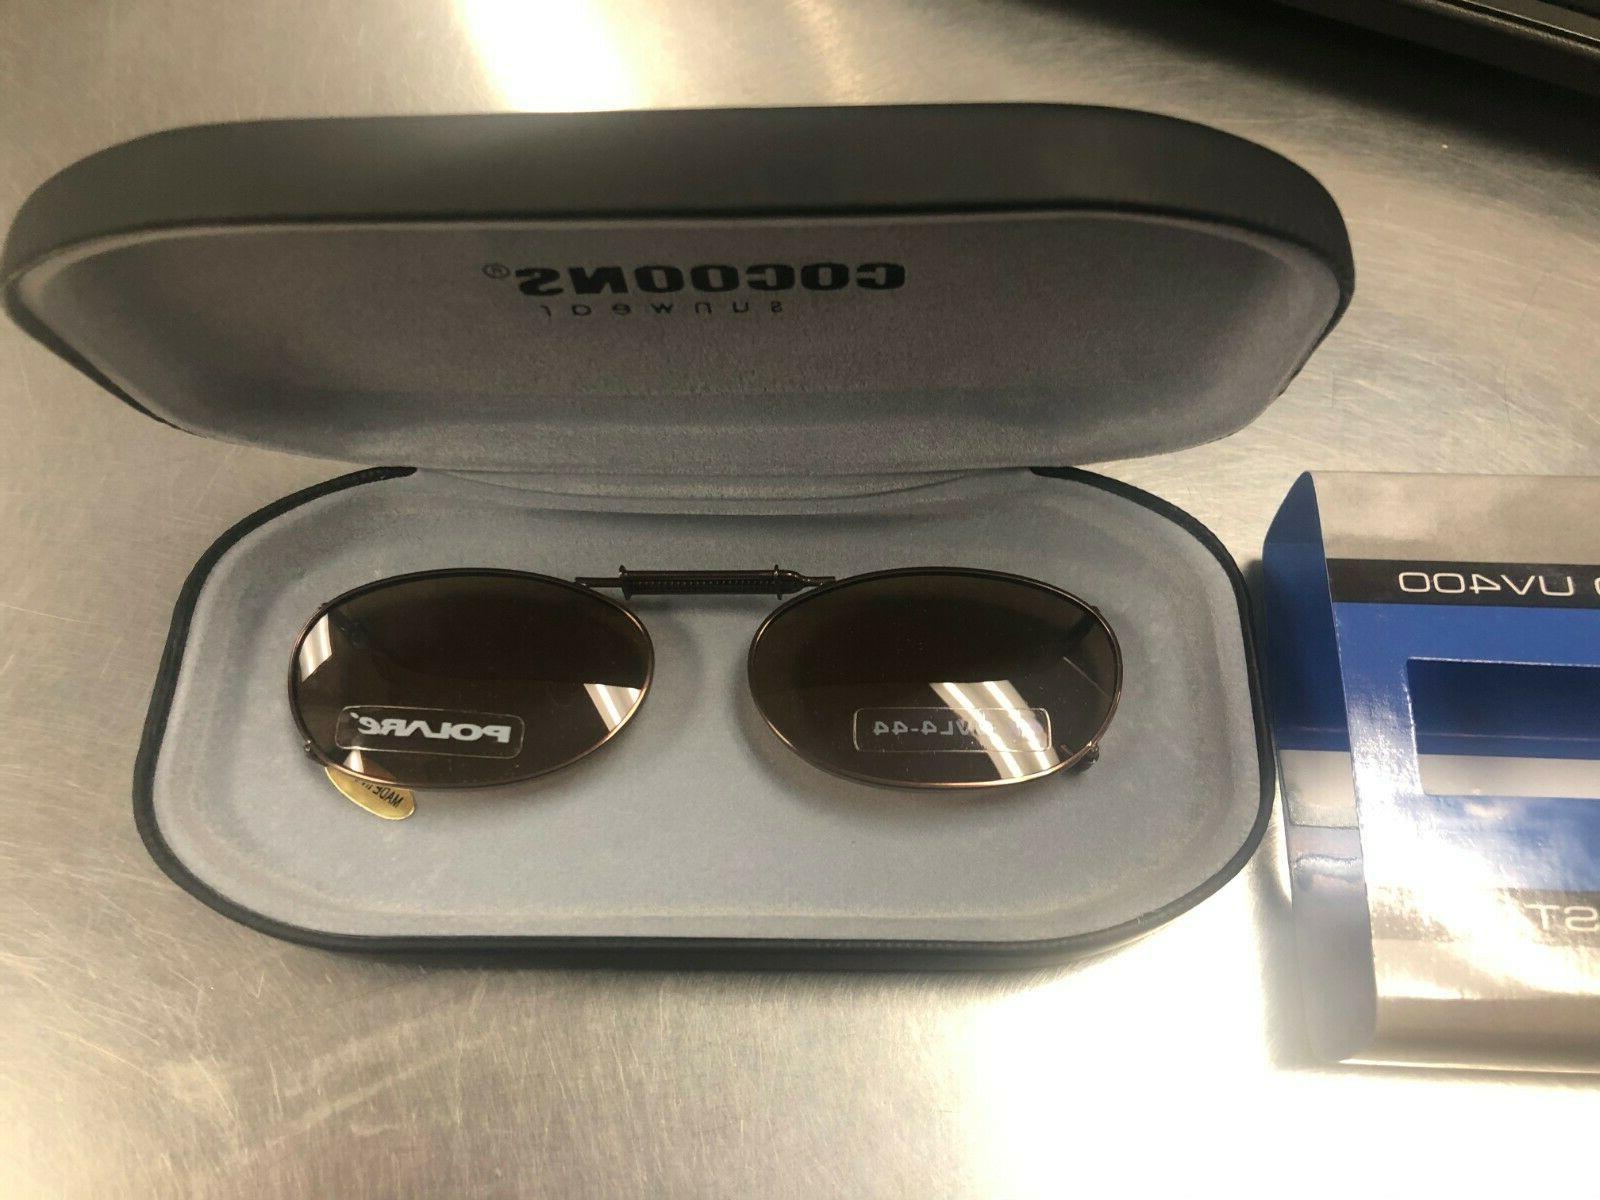 clip on sunglasses ov4 44 bronze